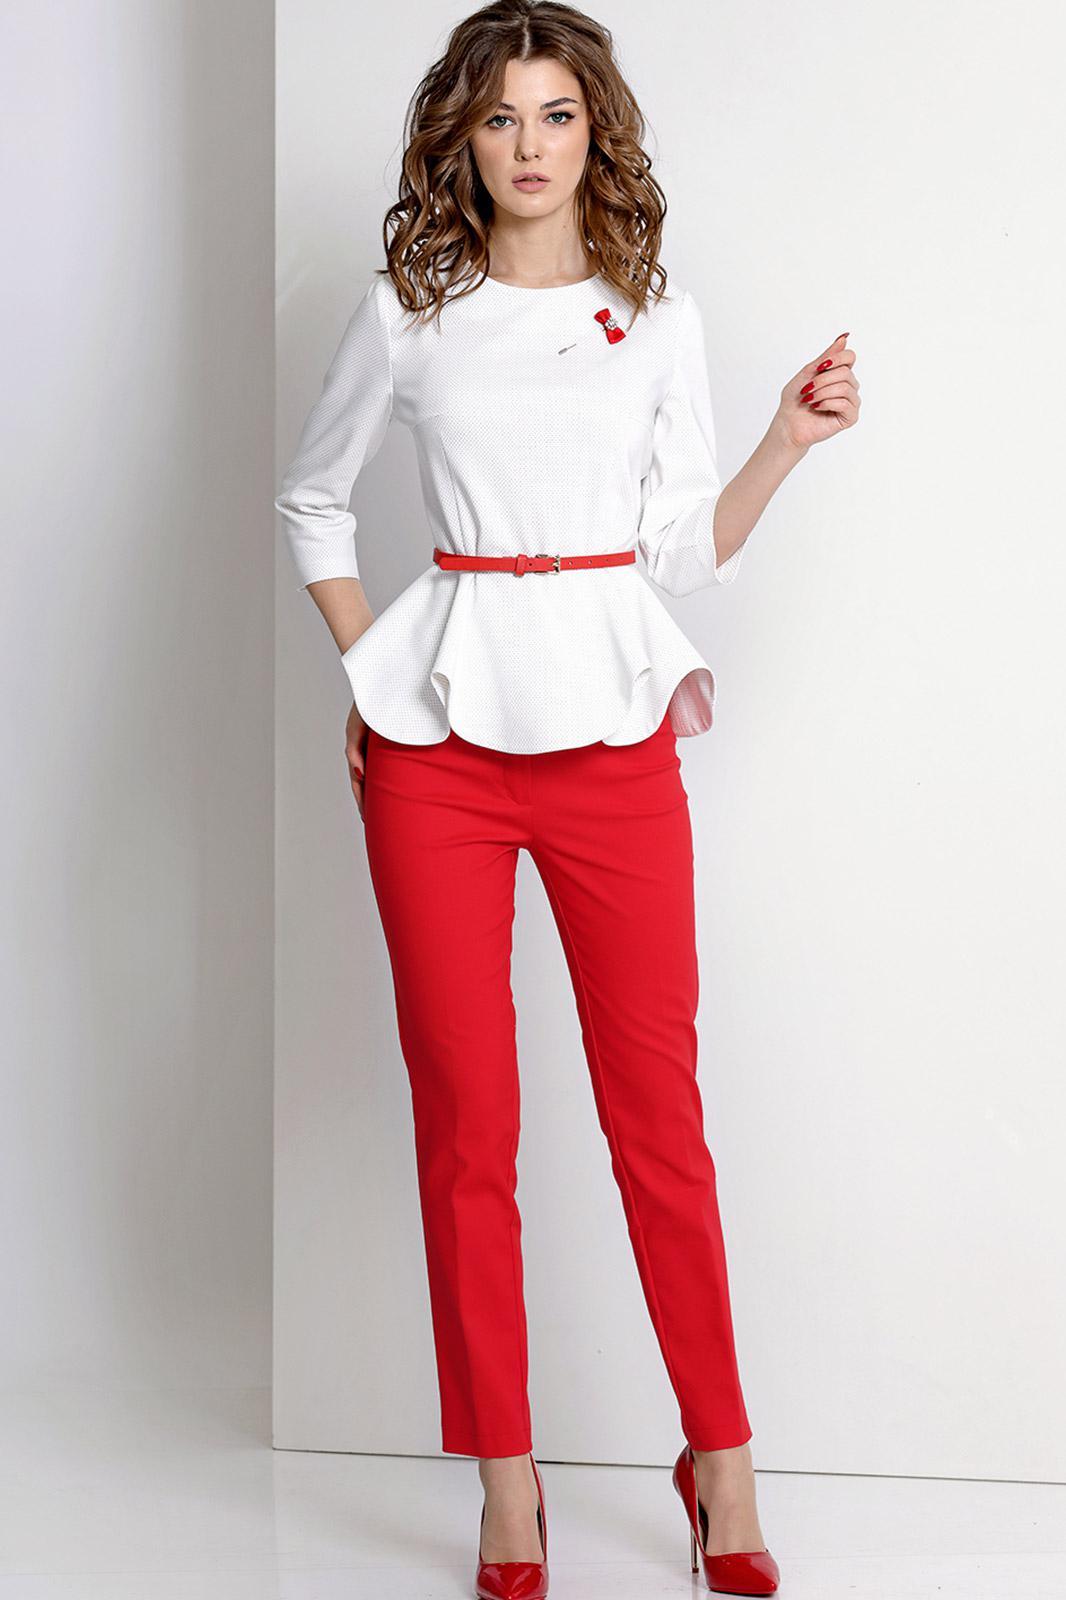 блузки под брюки фото простой метод